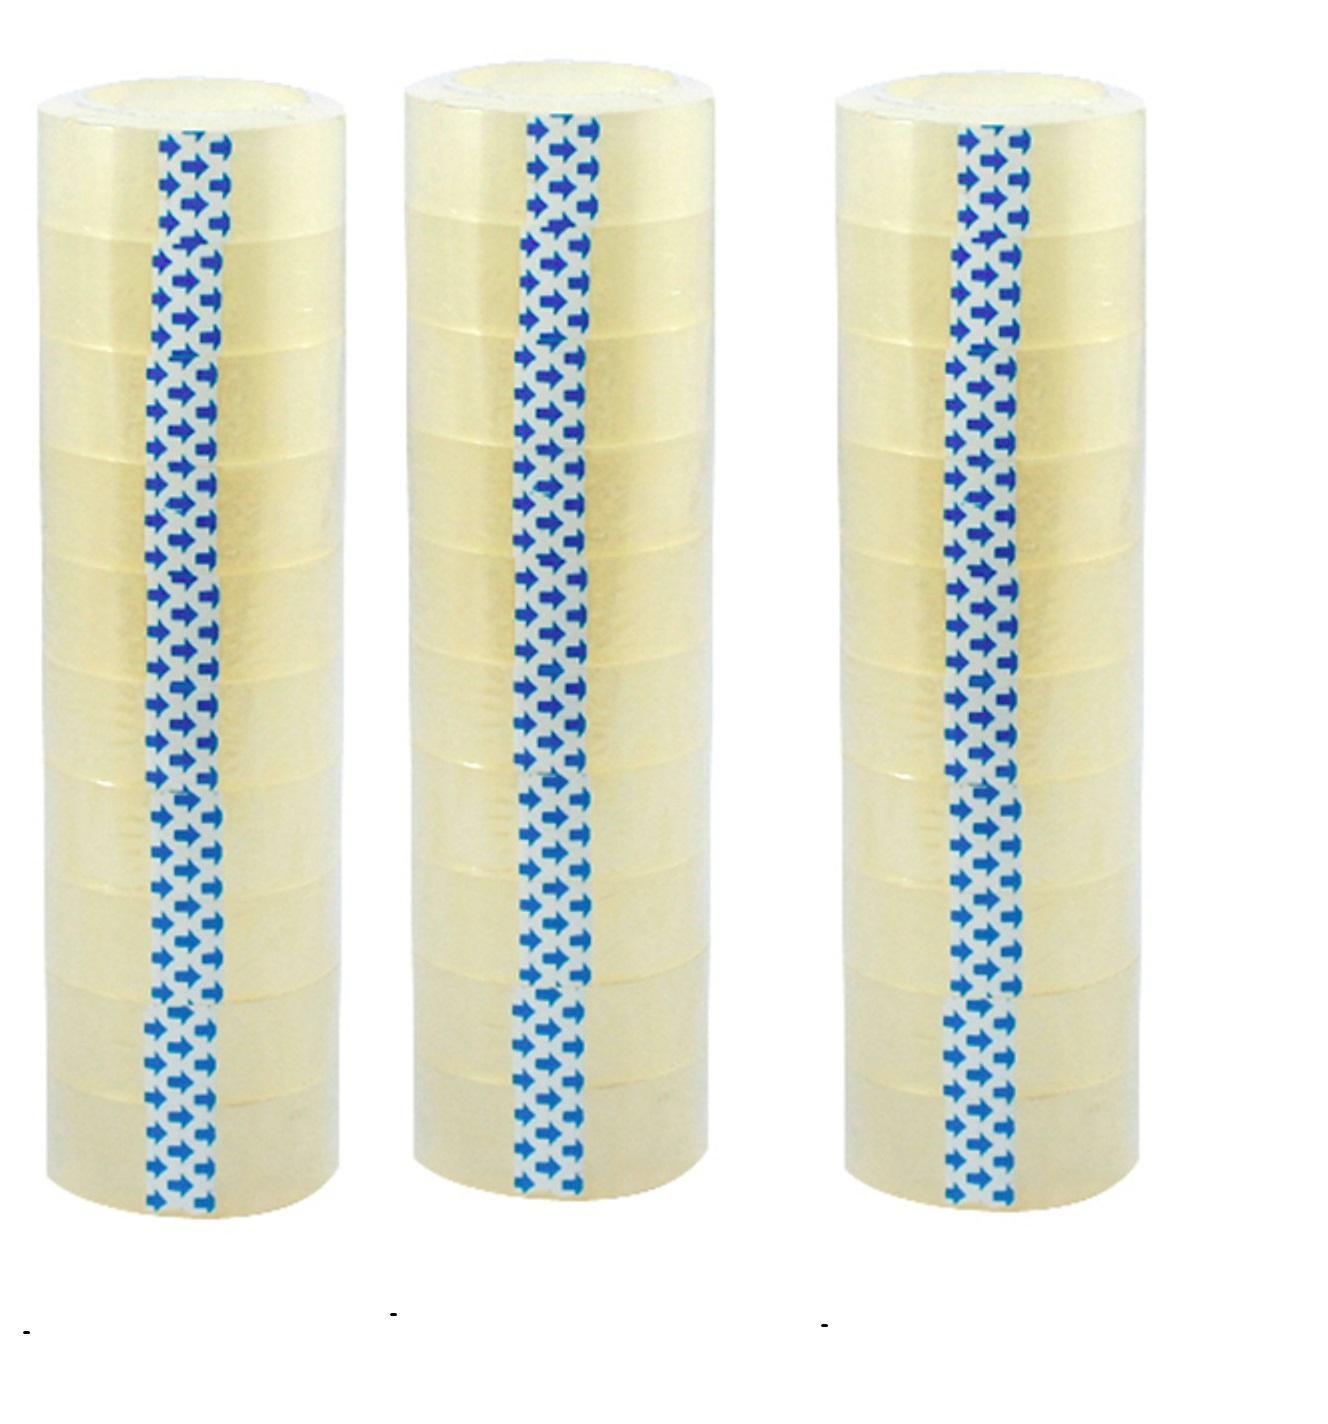 Mua Combo 30 cuộn băng keo trong loại nhỏ 18 Yard, 18mm, 420gram